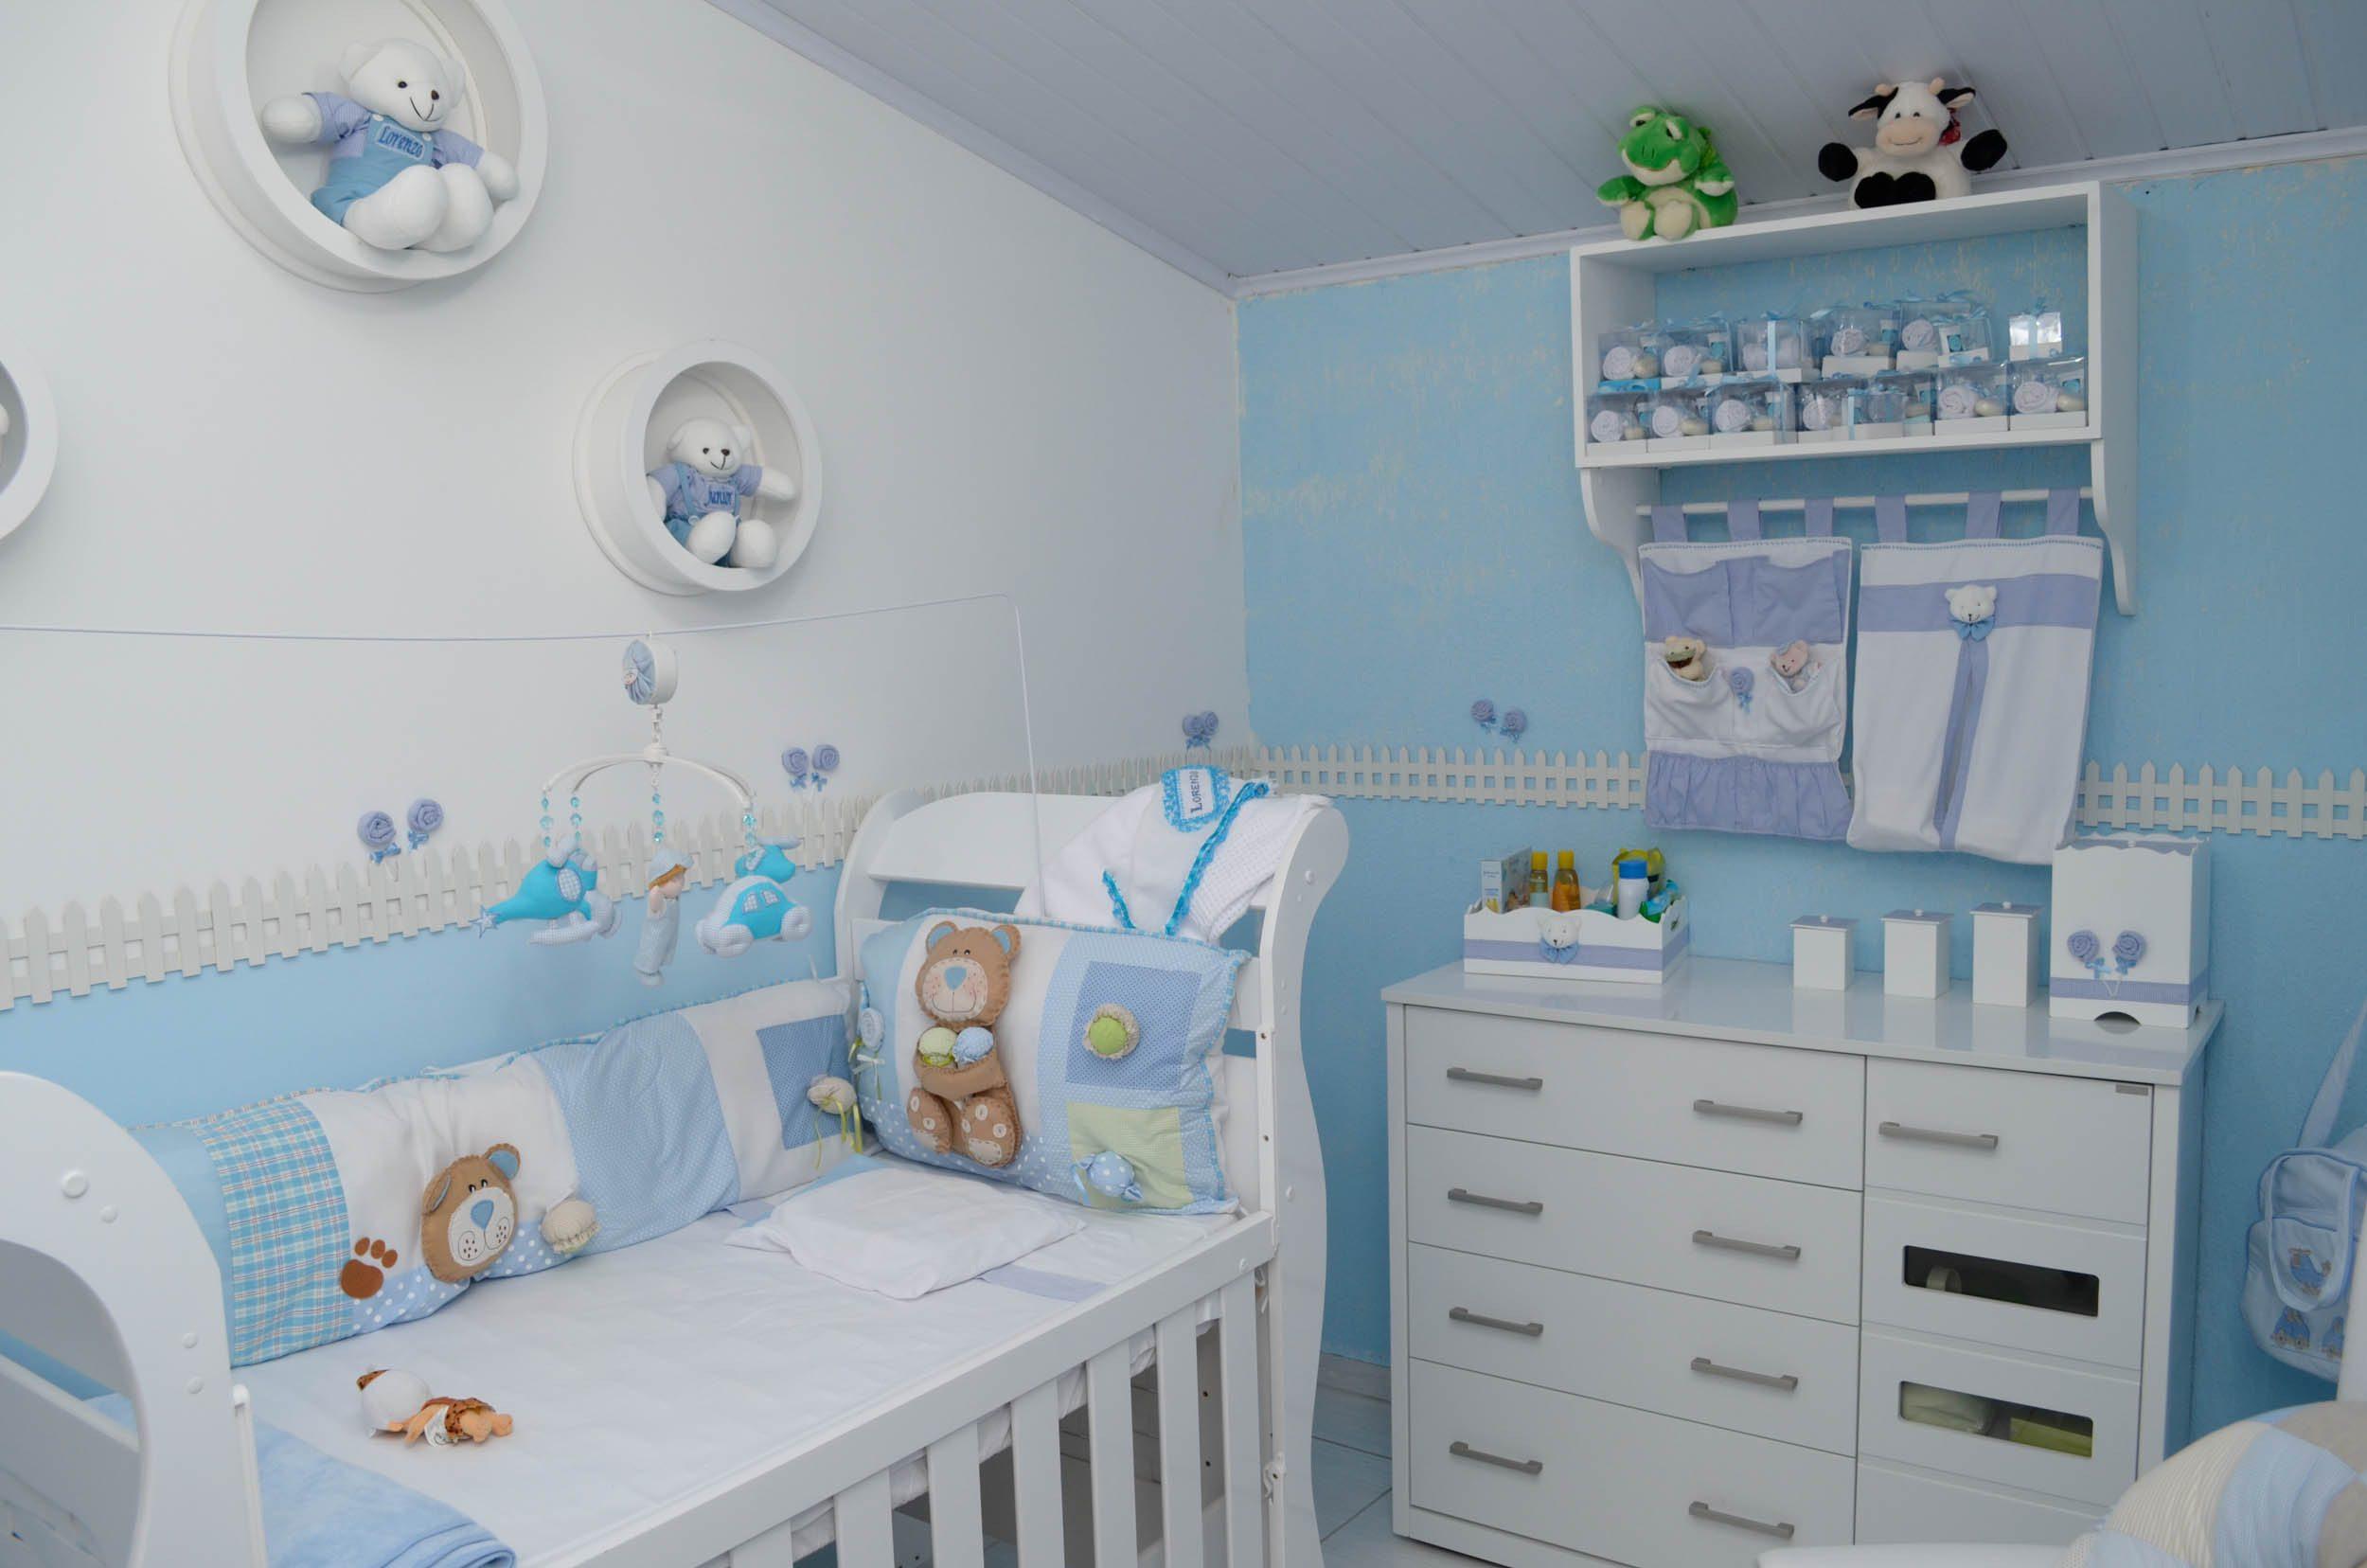 decoracao simples para quarto de bebe 1